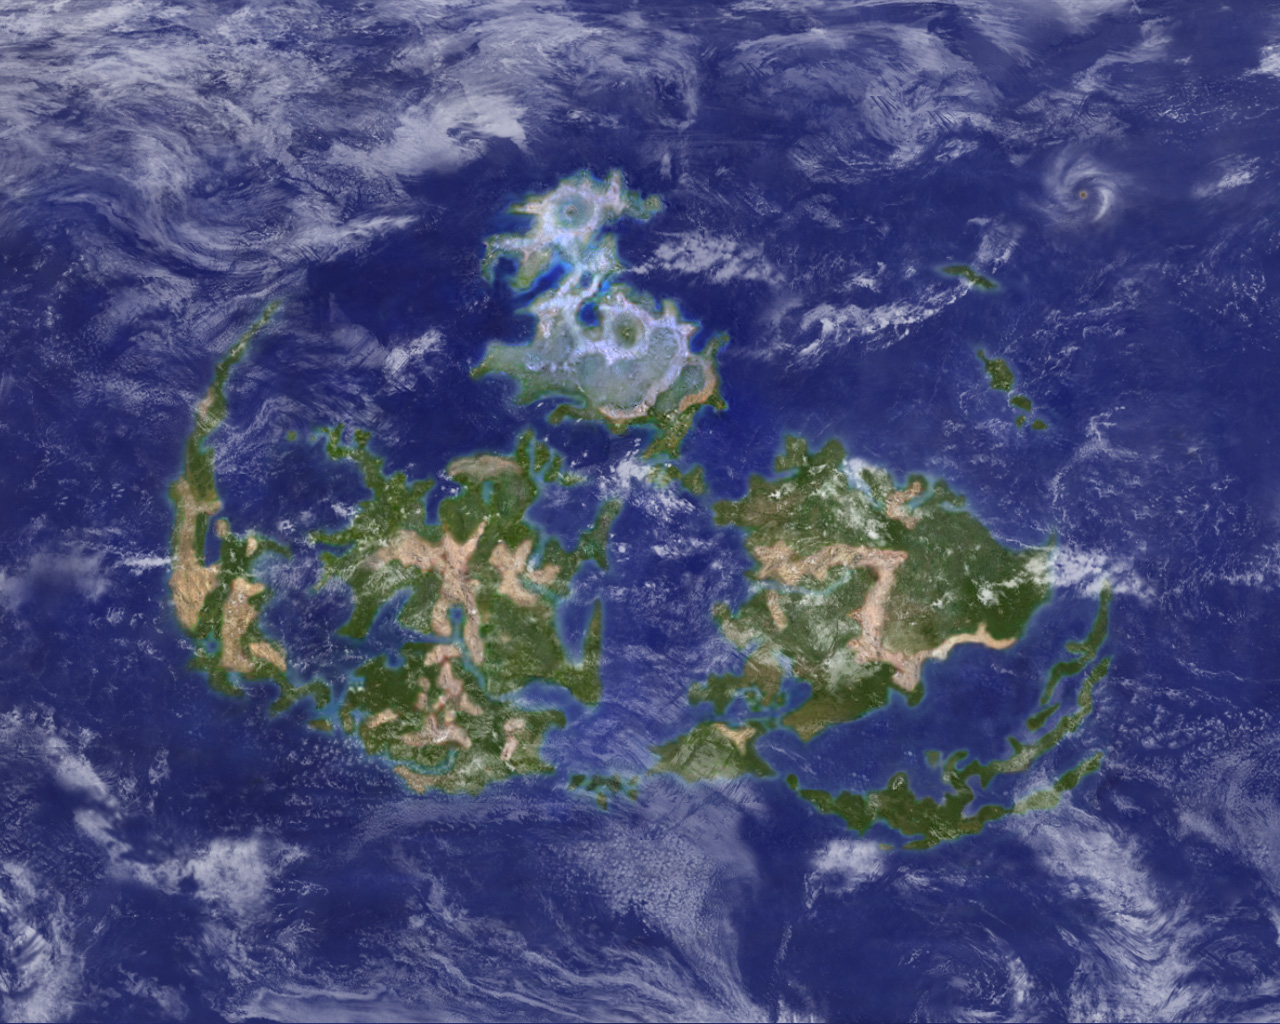 sephirosuy - Life is RPG: Final Fantasy VII world map \